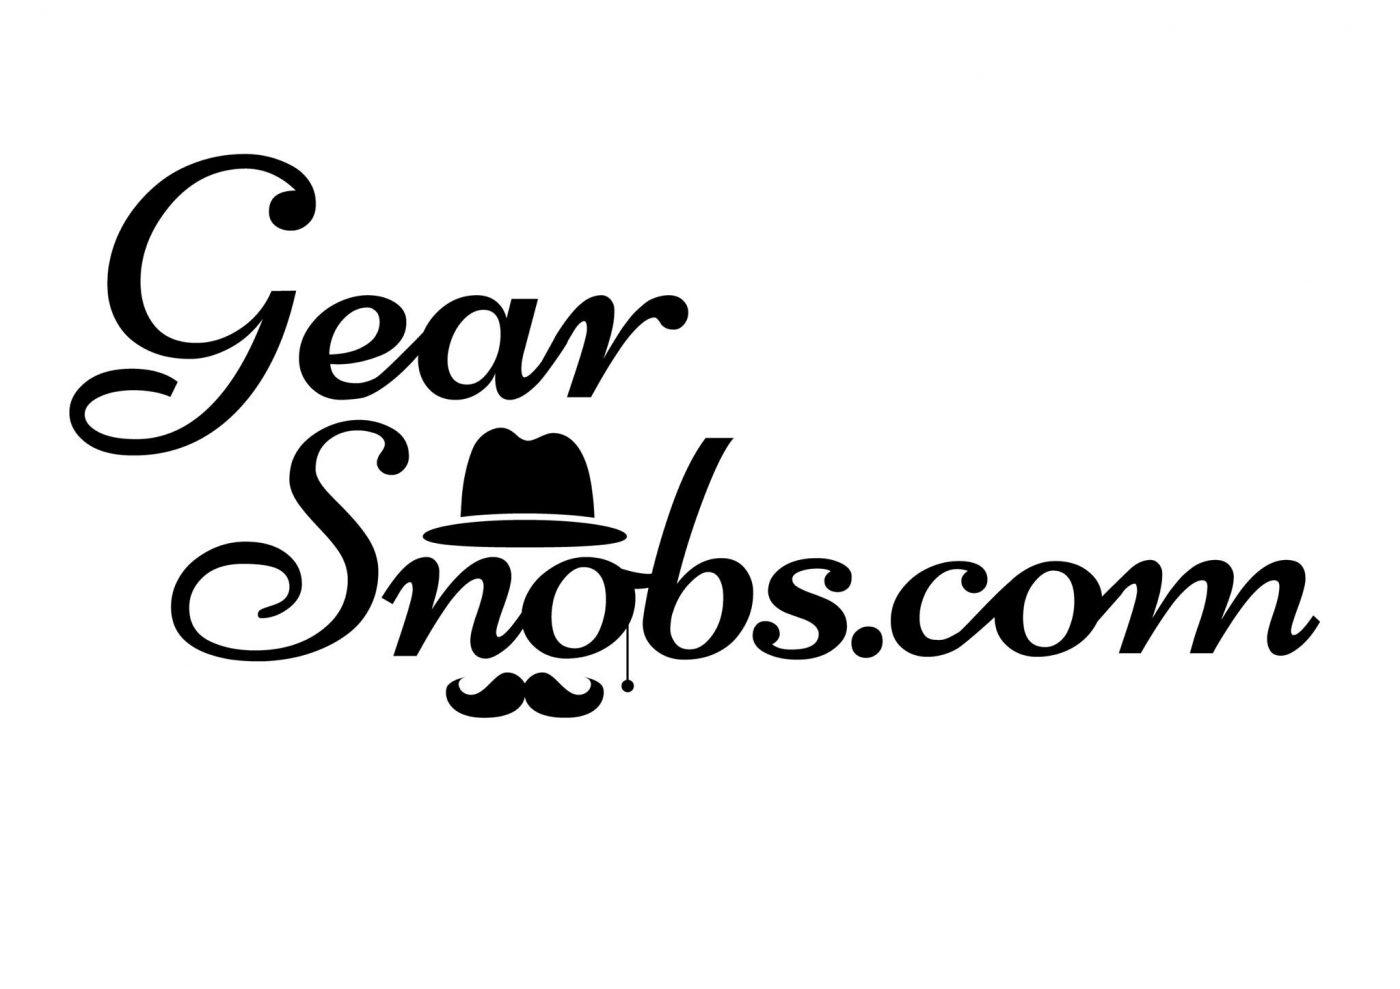 Gear Snobs